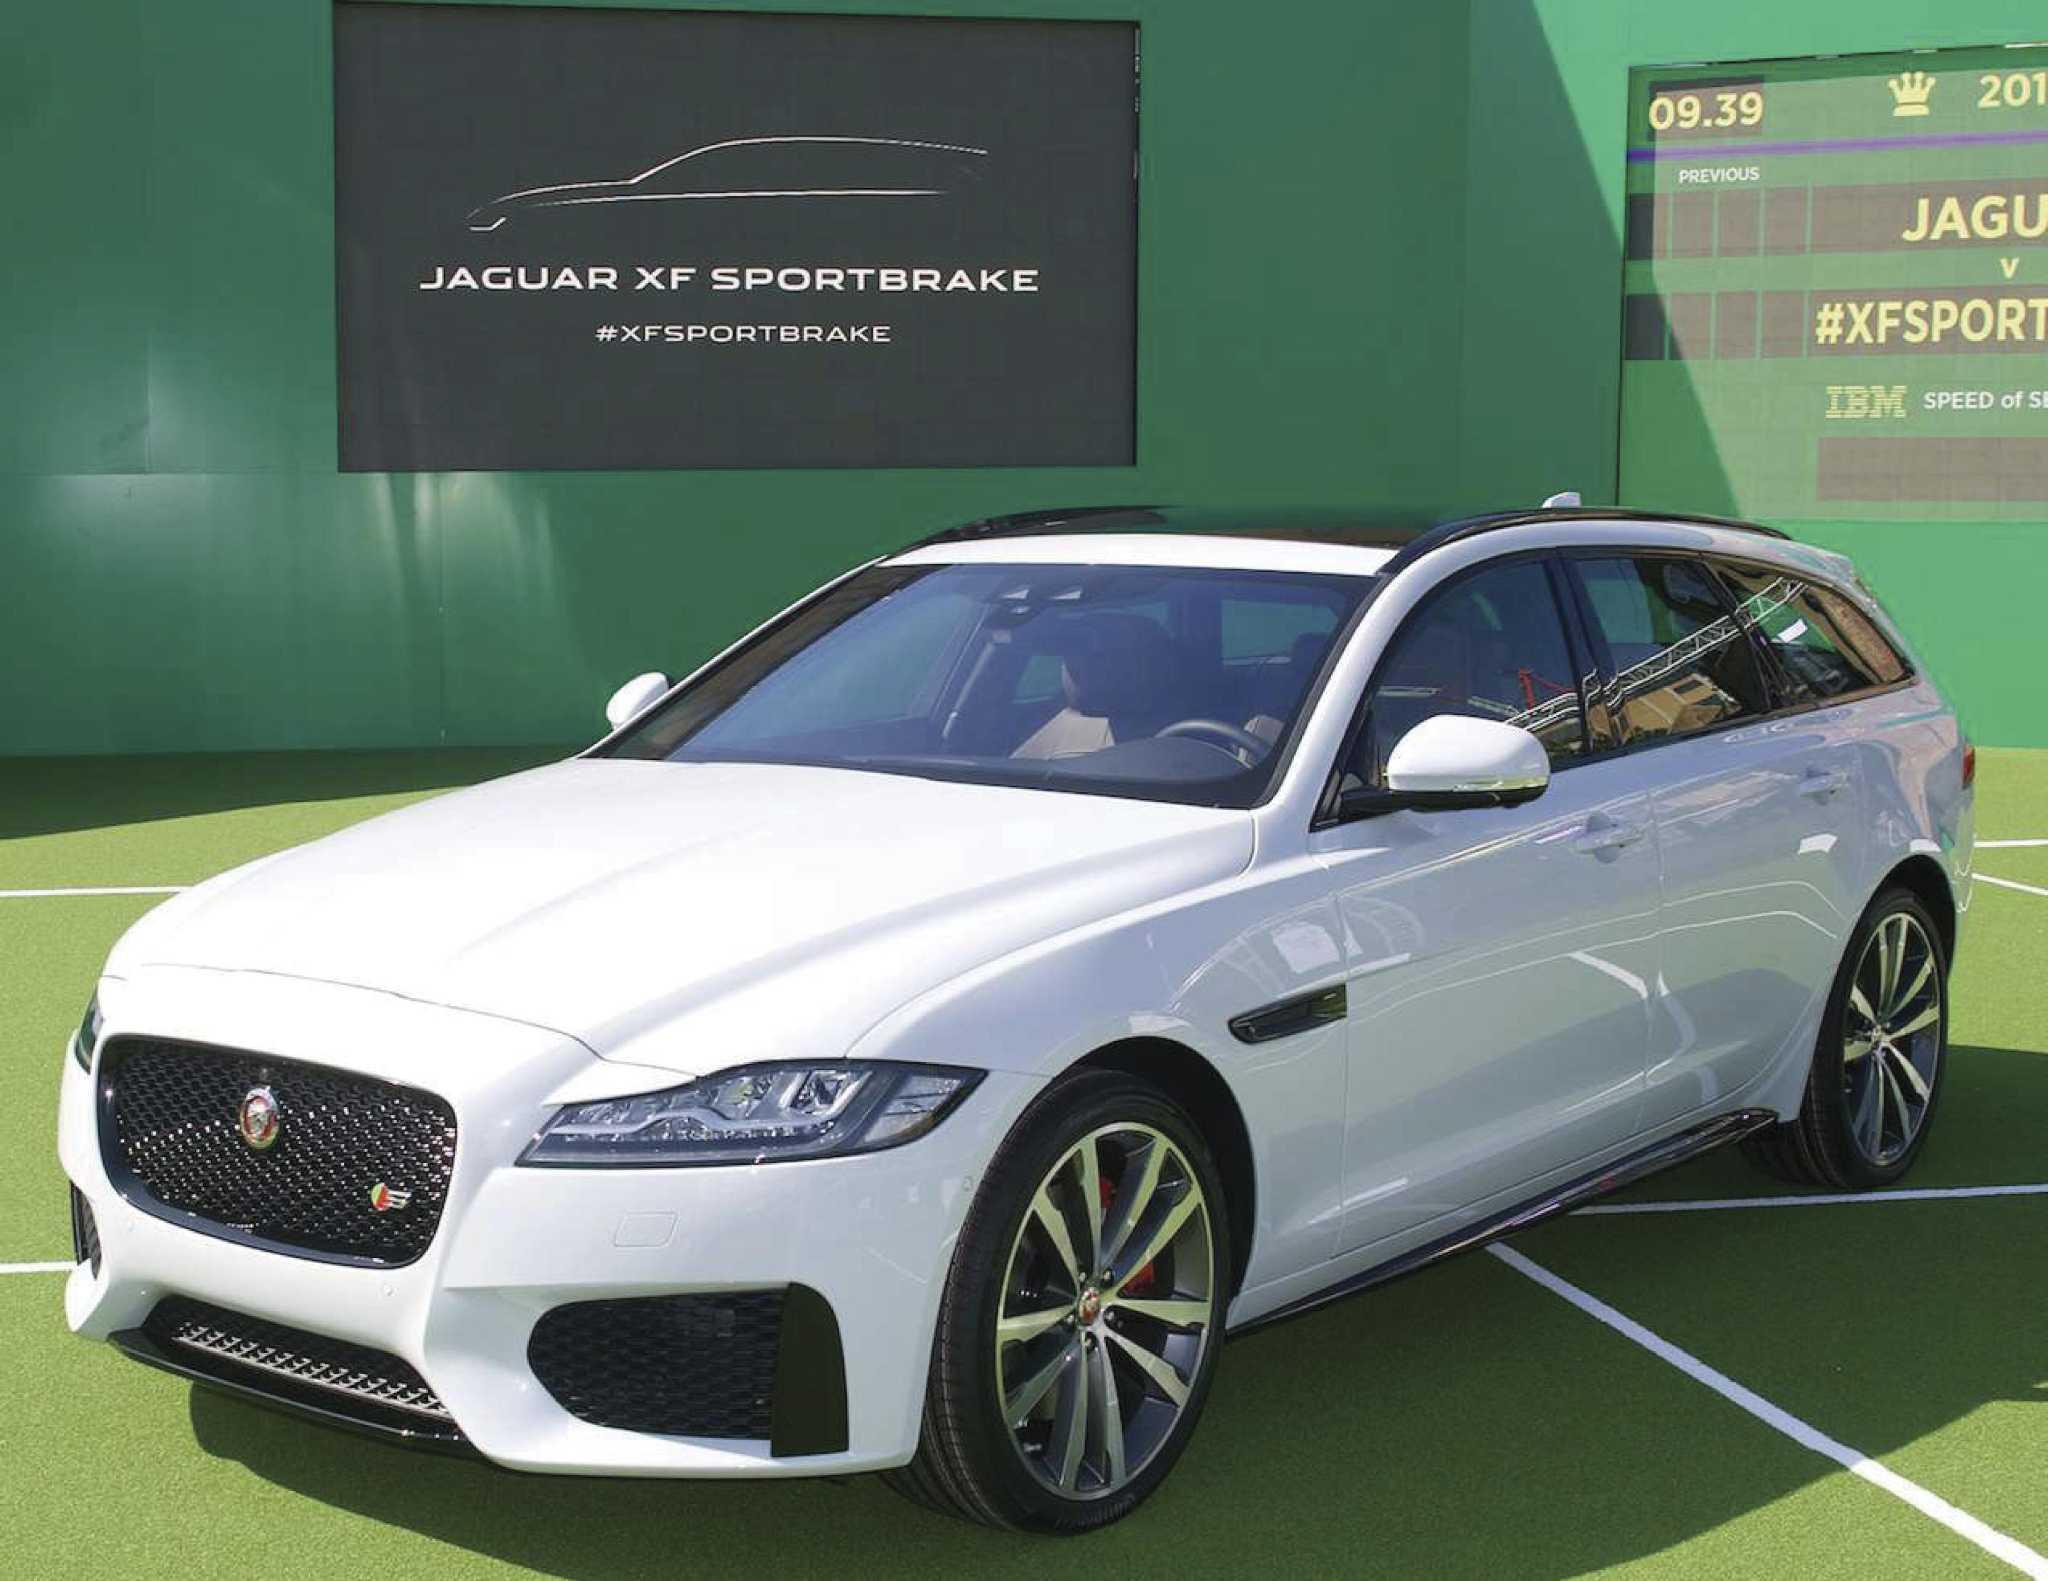 Jaguar brings its XF Sportbrake wagon to the US